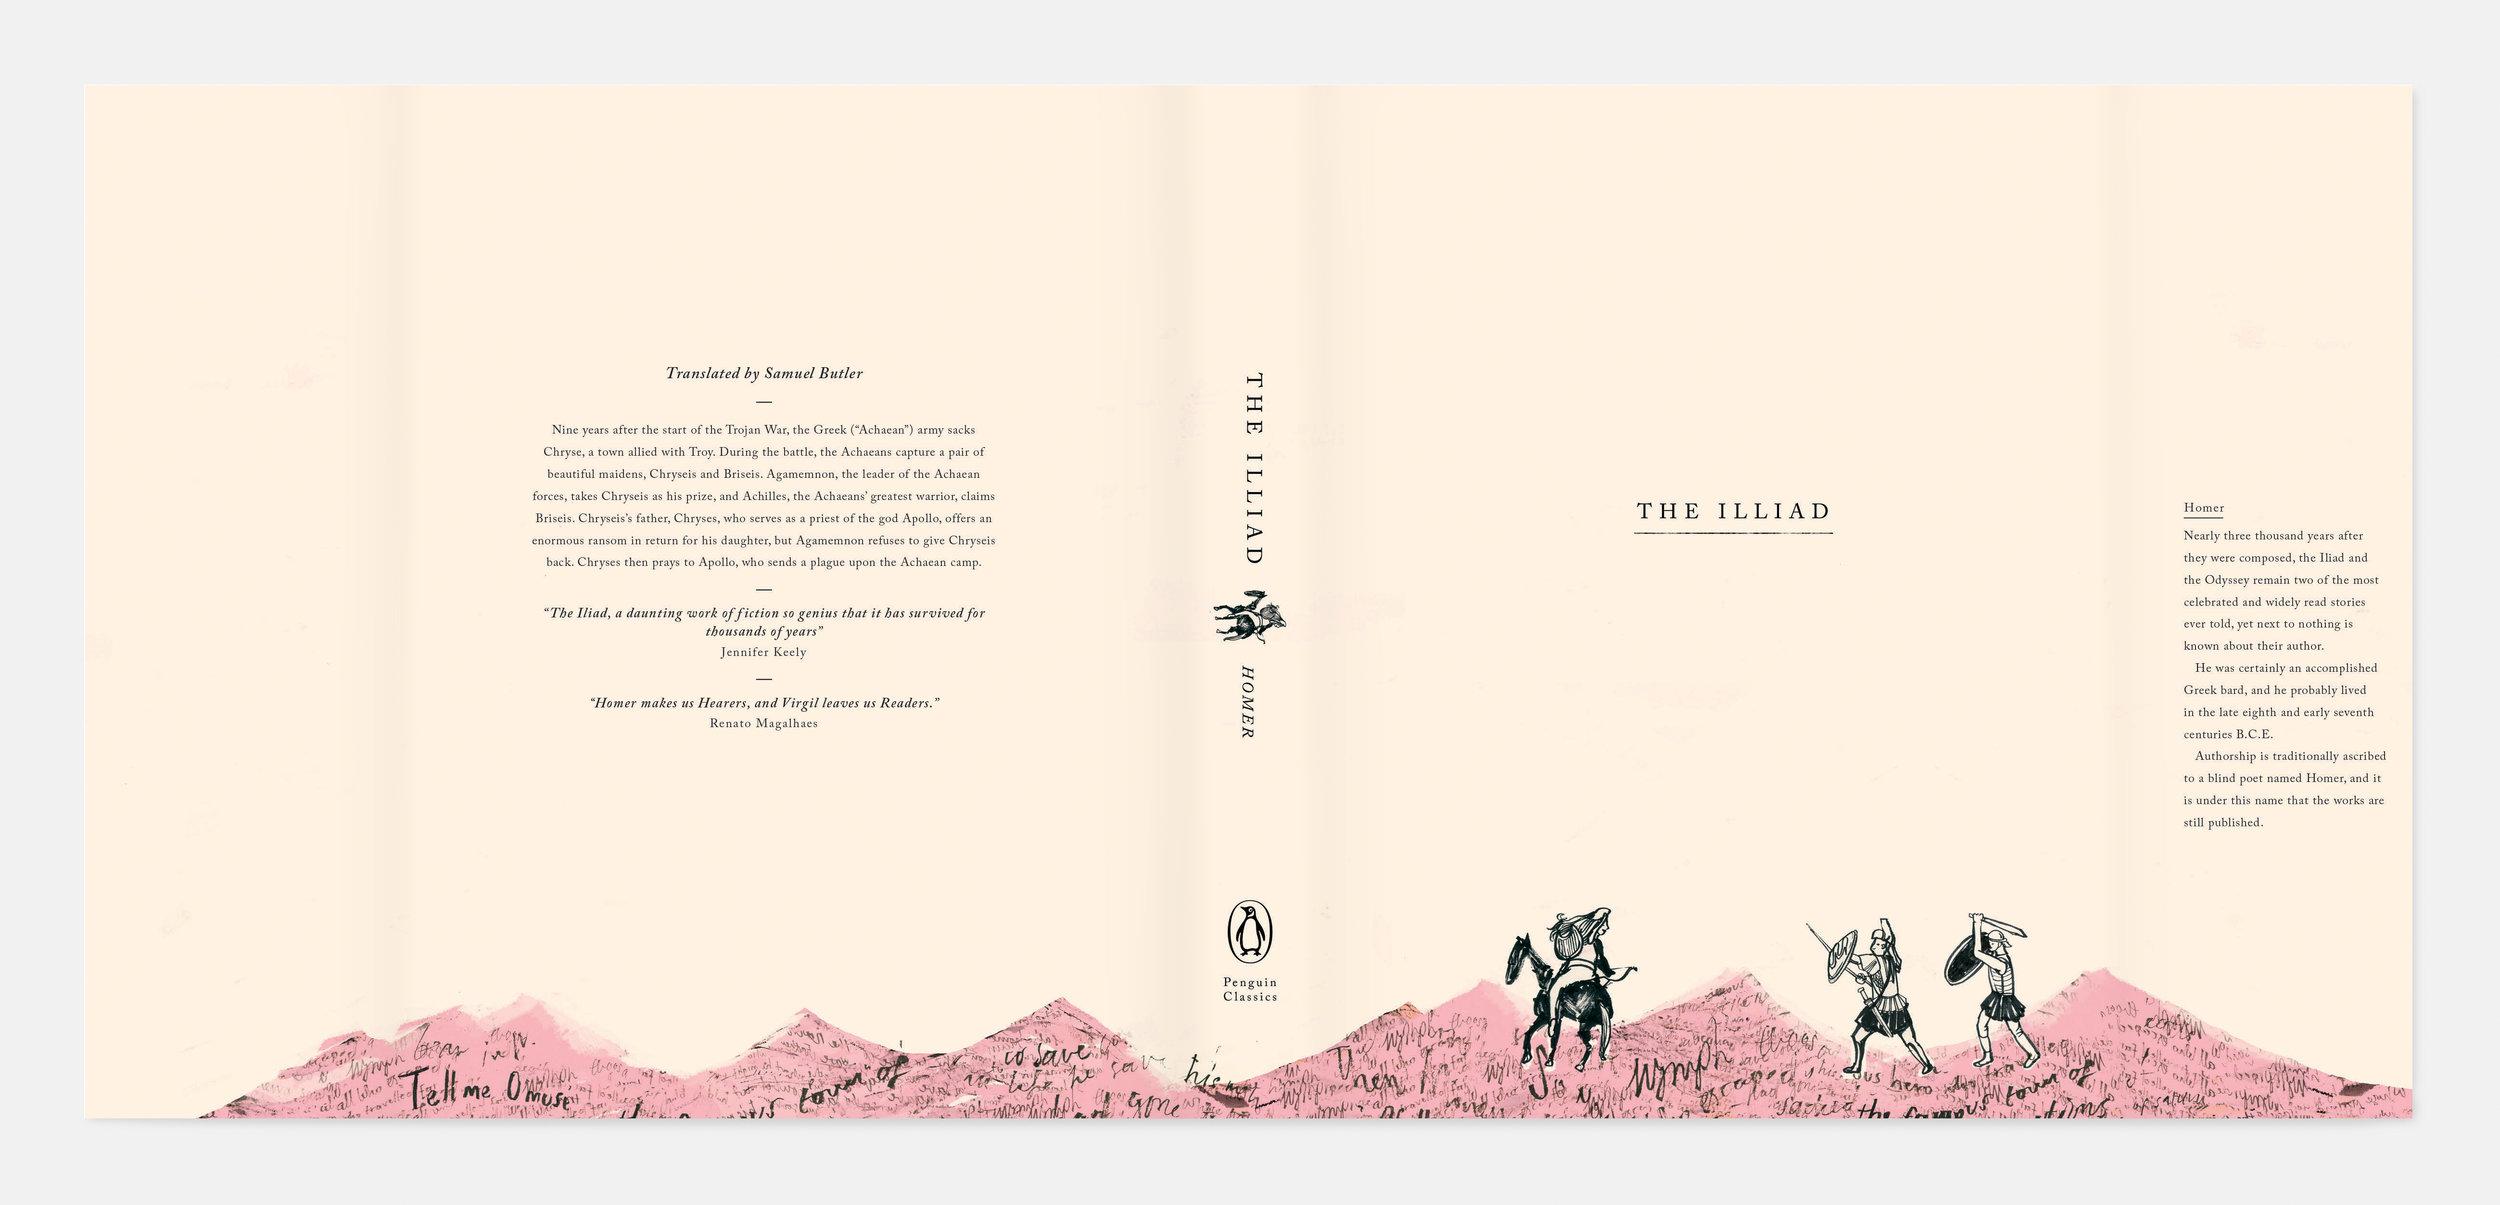 theilliad_book_spread.jpg